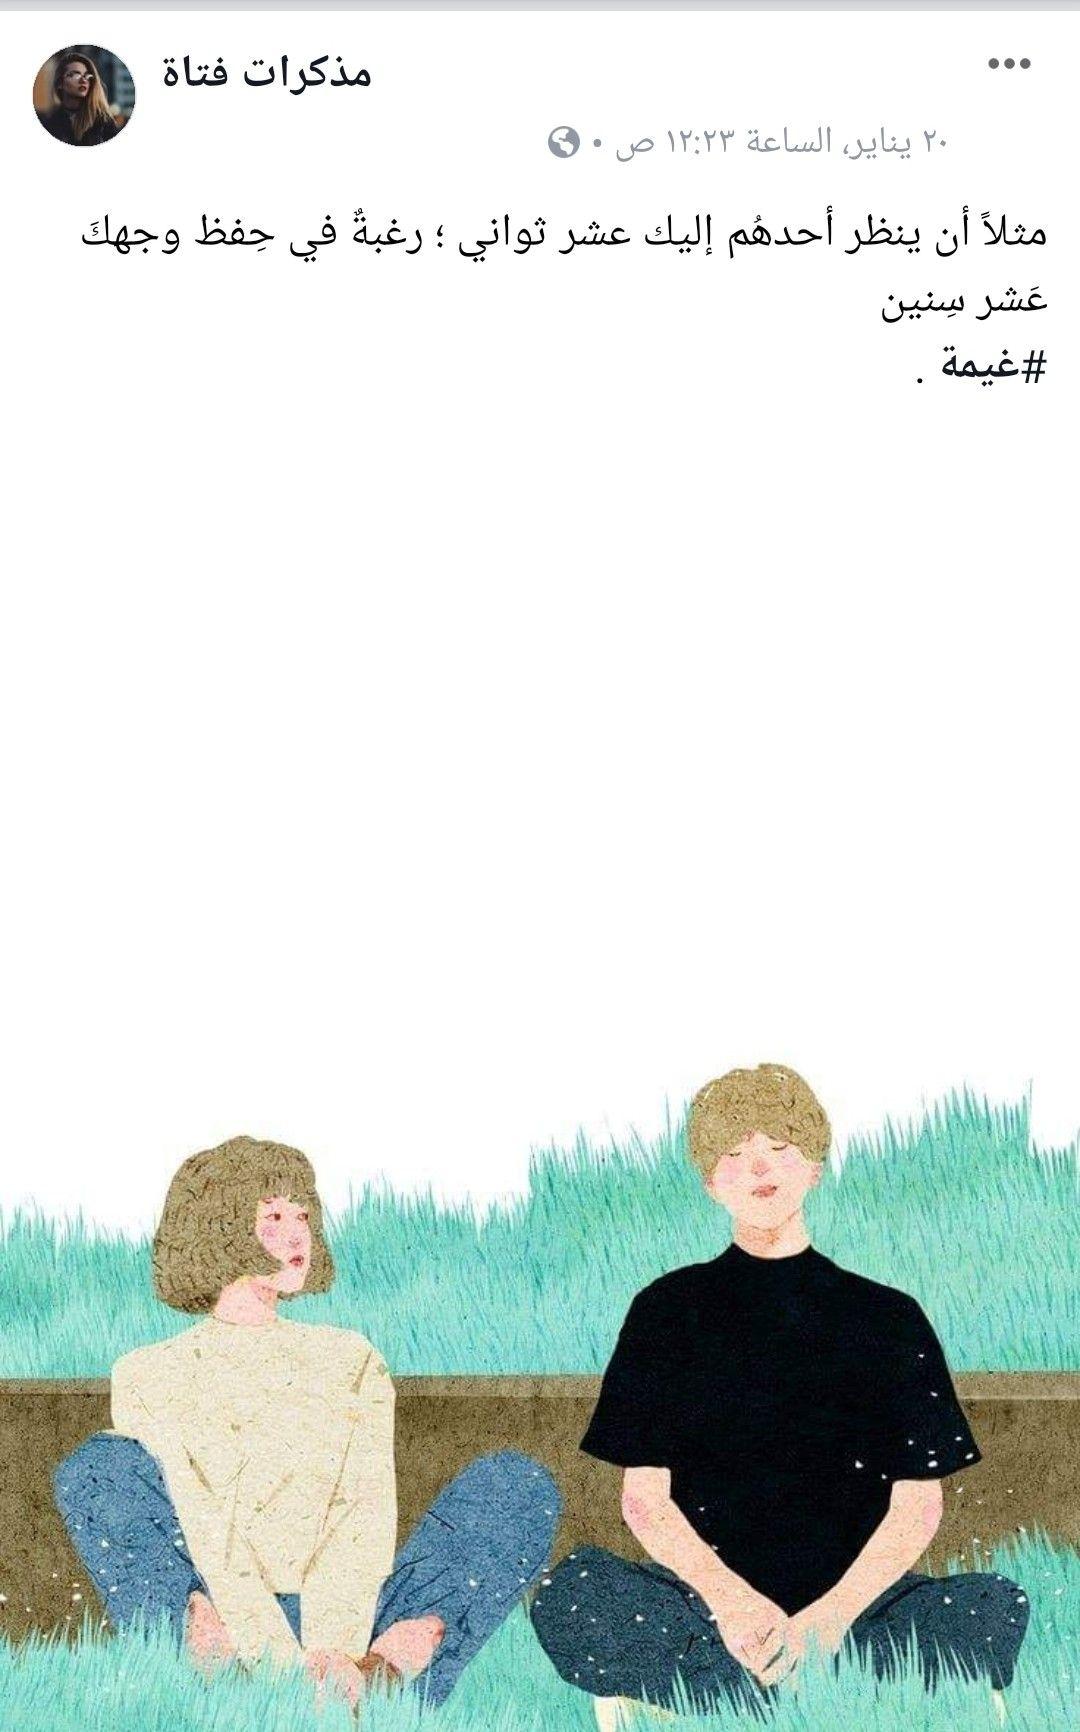 Arabic Love Quotes Image By Dဂ Ha In 2020 Beautiful Arabic